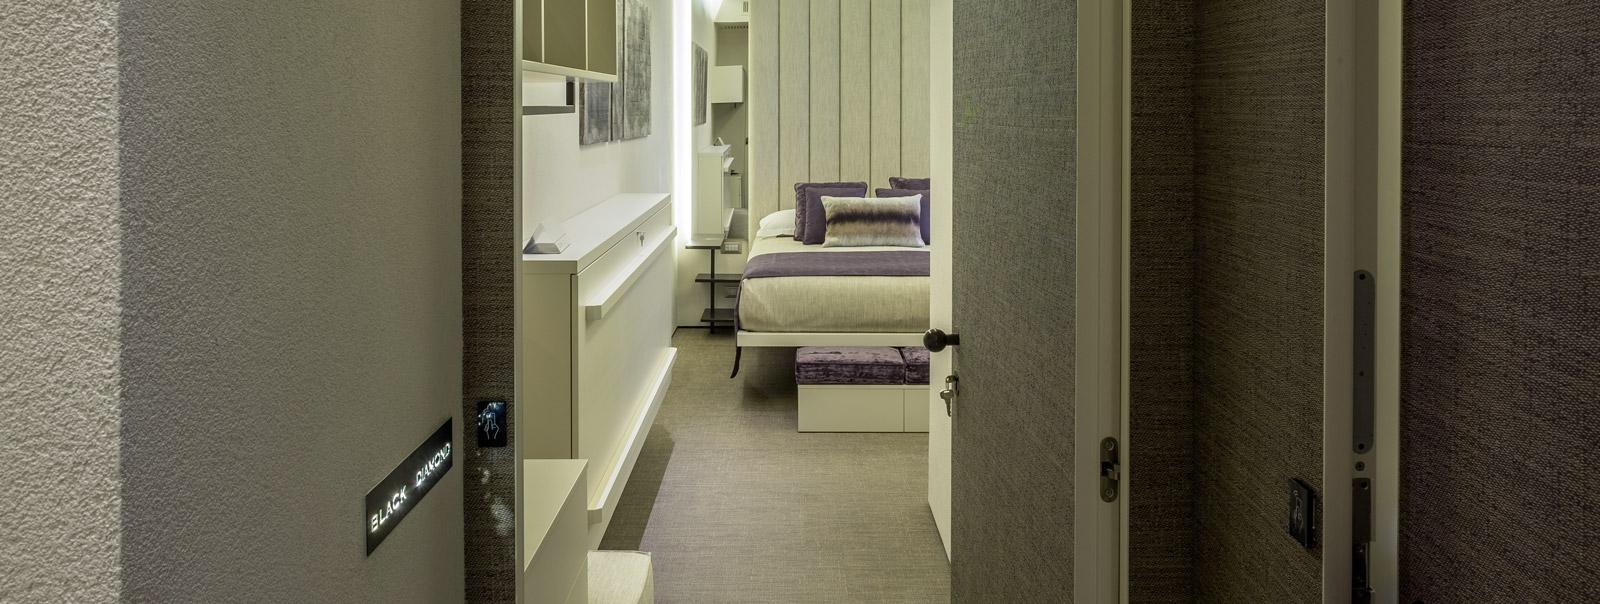 Room 230 Luxury suites Rome, Luxury rooms, vacanze Roma